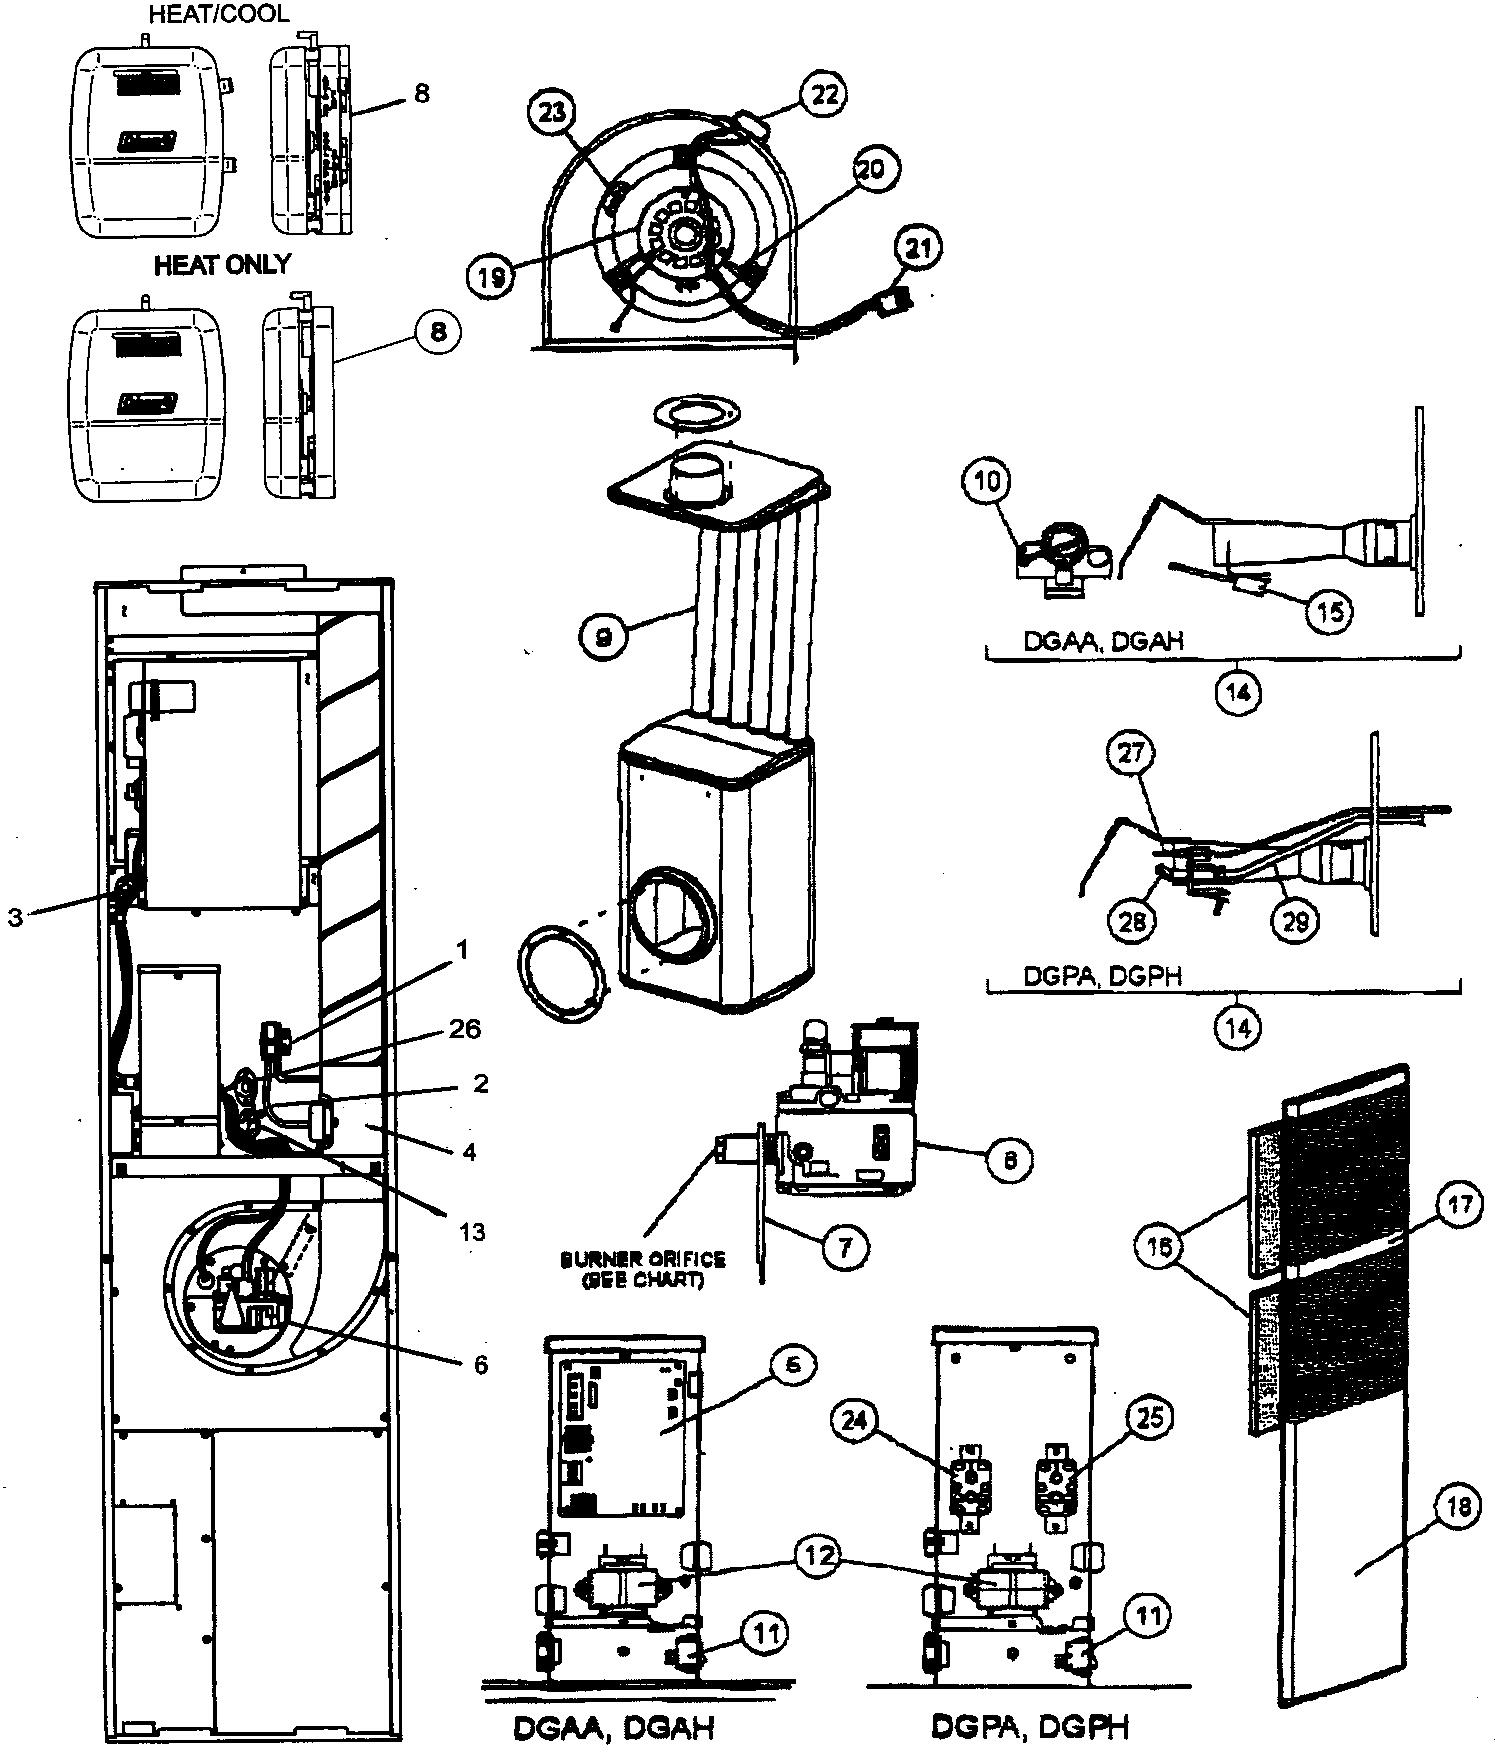 CABINET PARTS Diagram & Parts List for Model dgpa056abta